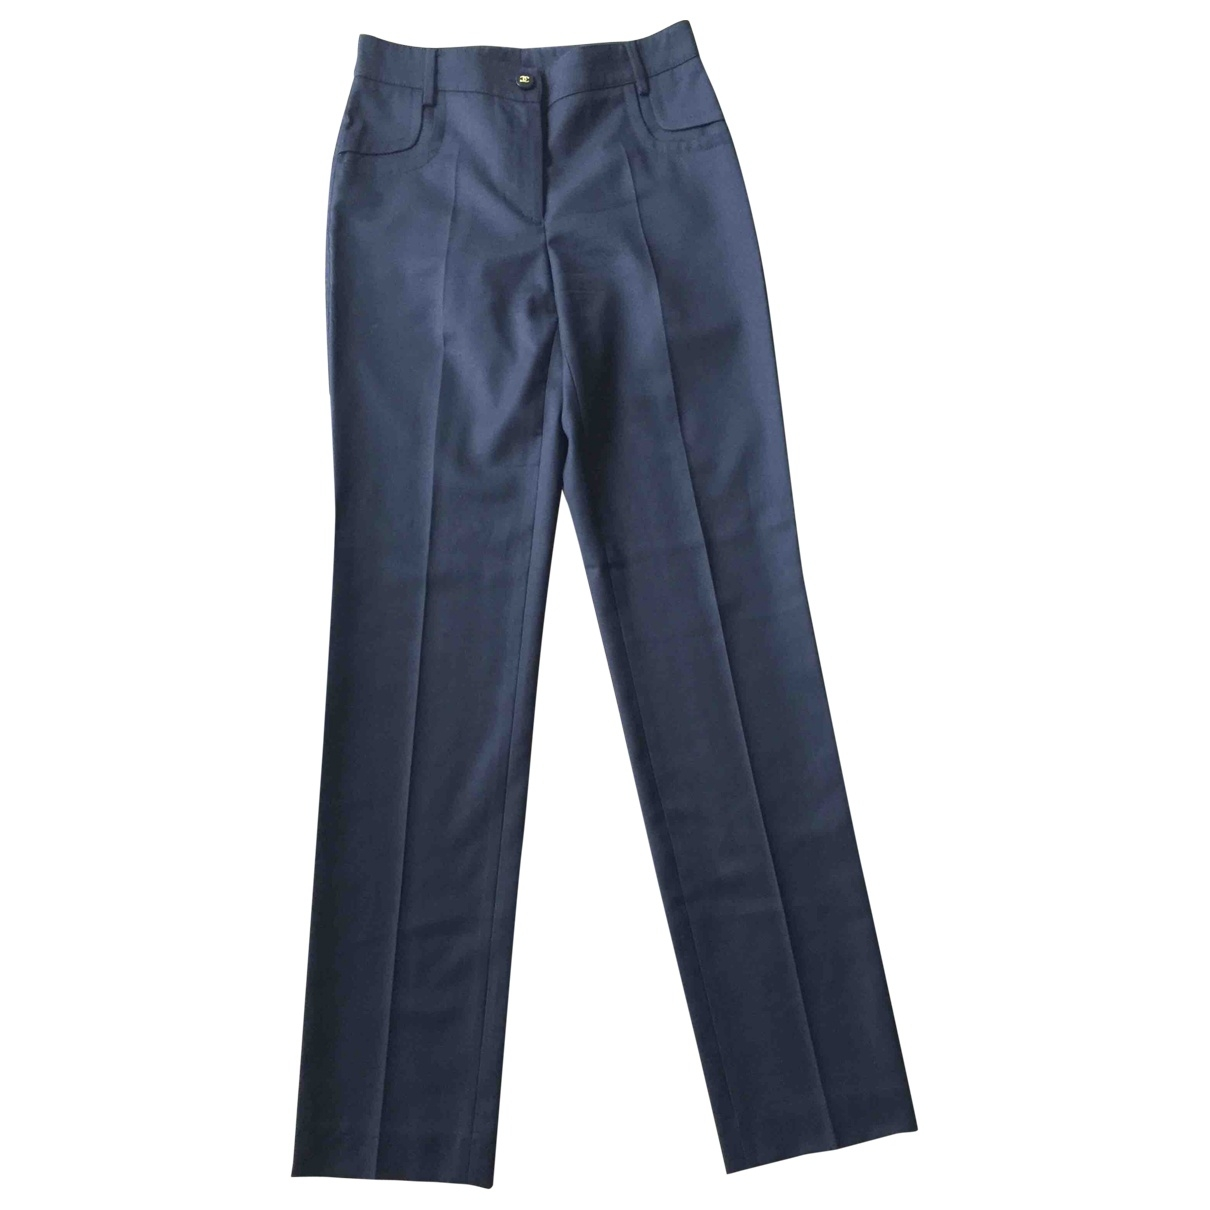 Chanel \N Navy Wool Trousers for Women 36 FR